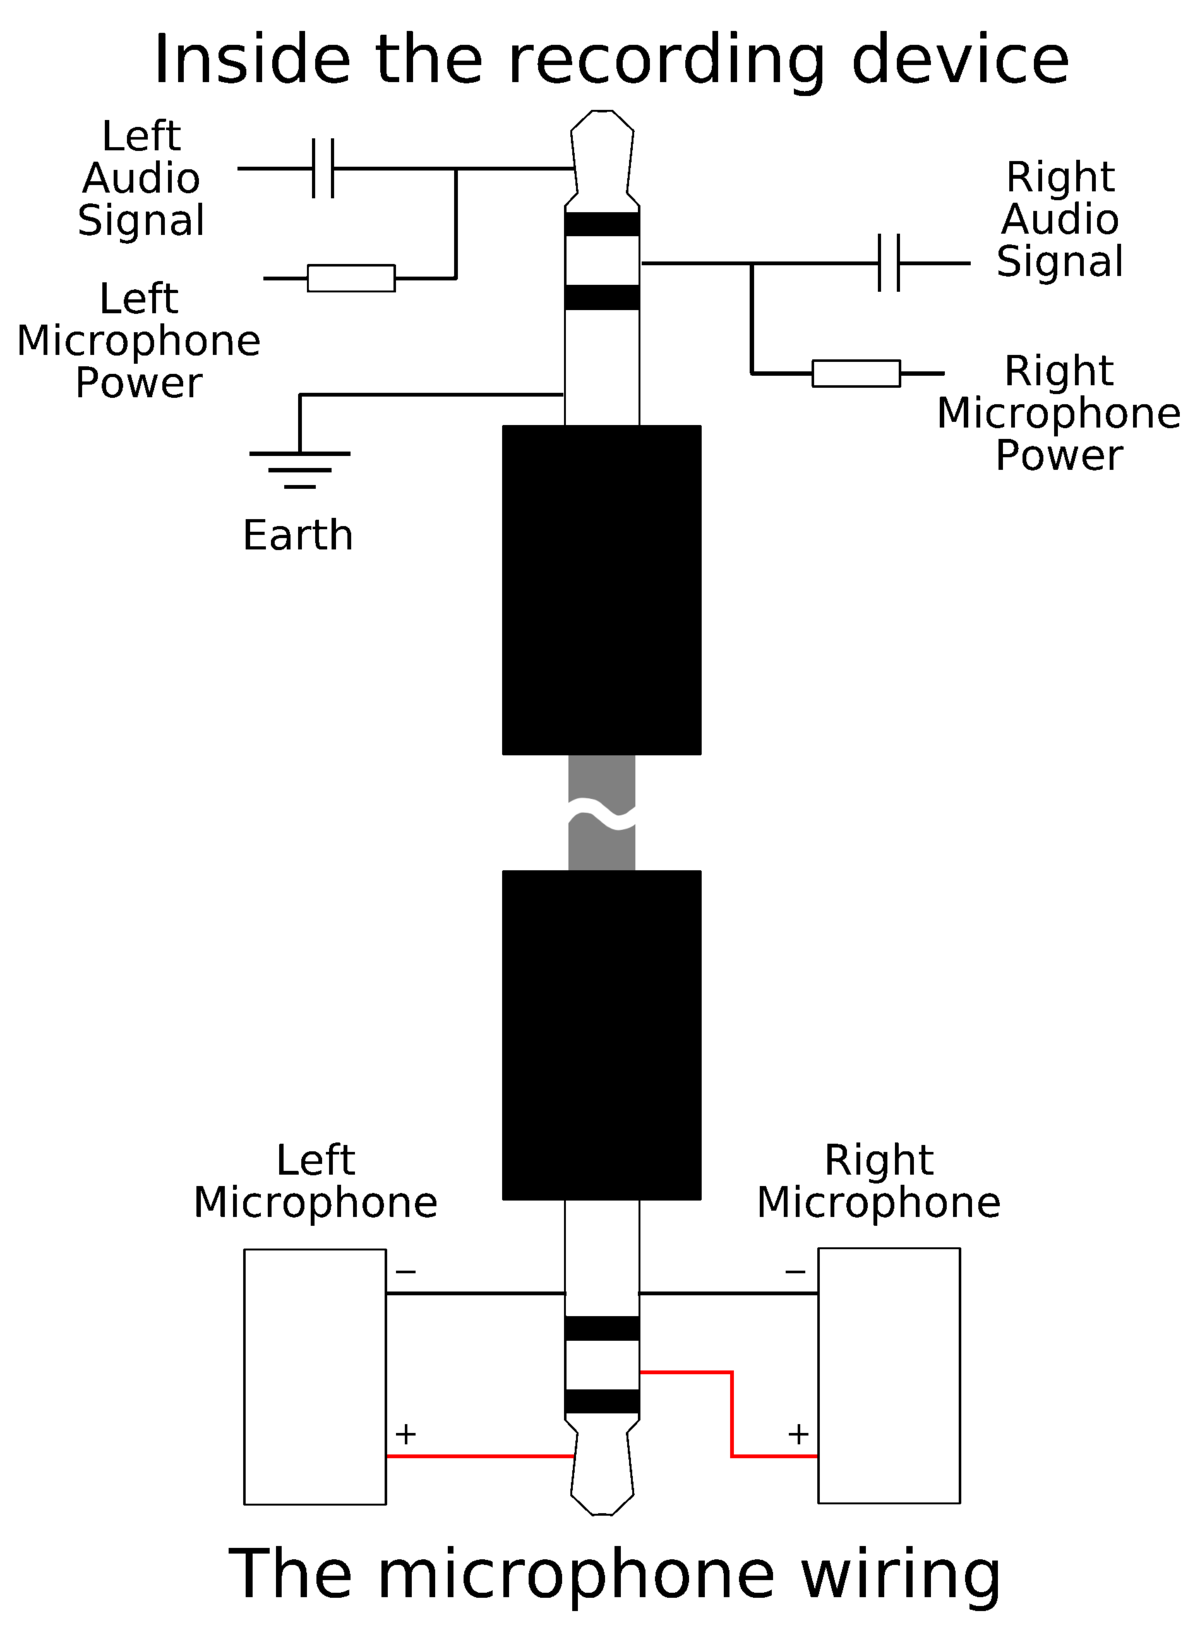 File:Jackplug-wiring.png - Wikimedia Commons